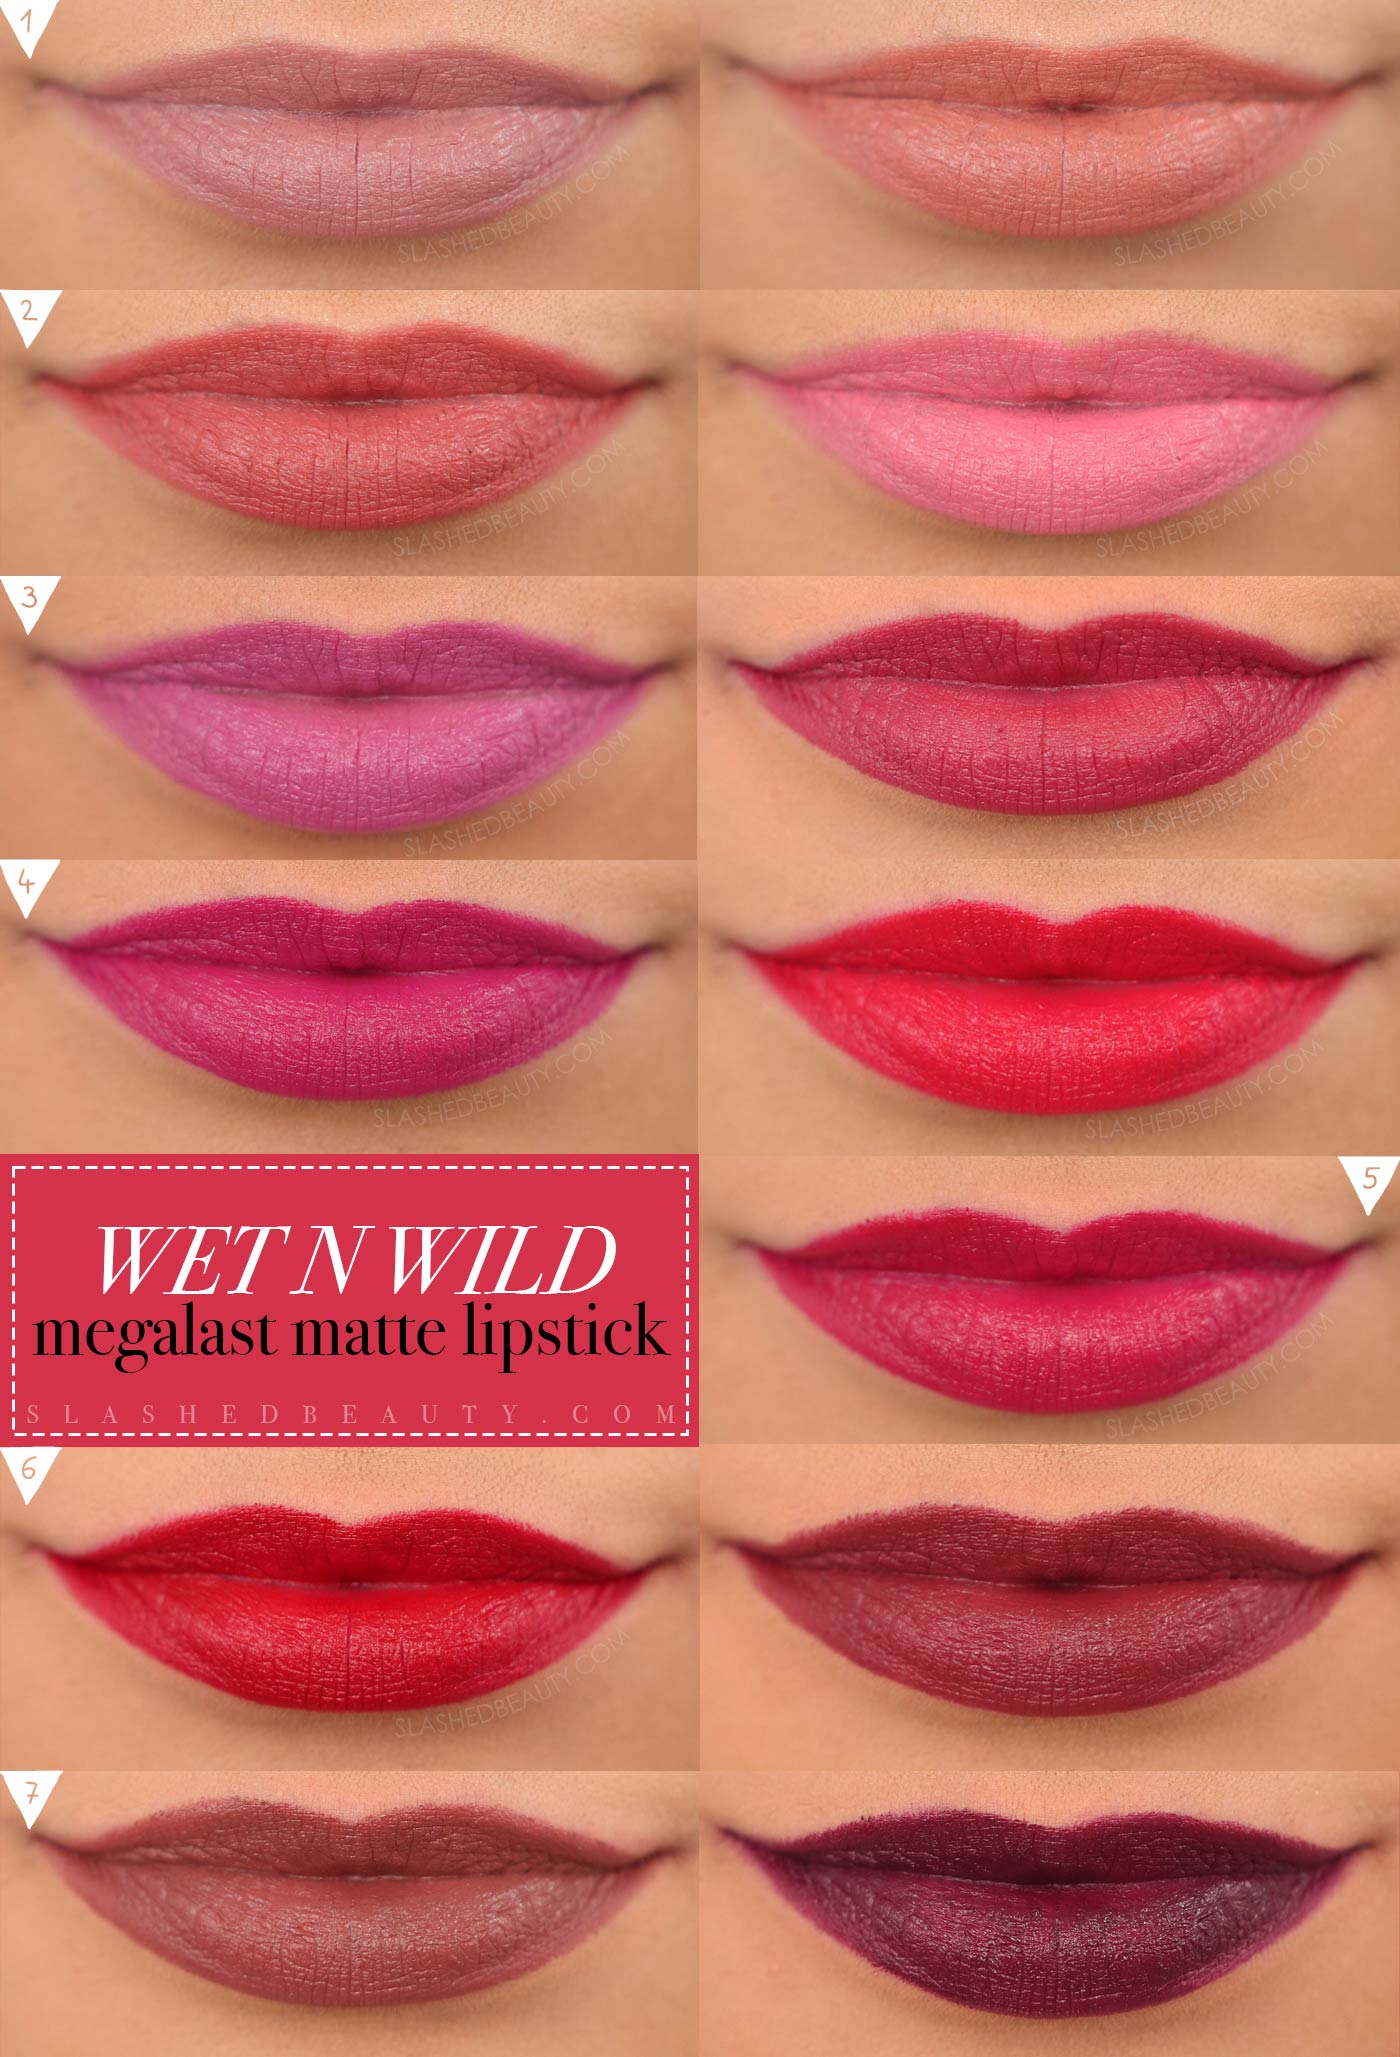 Wet n Wild Megalast Matte Lipsticks Swatches All Shades | Moisturizing Matte Drugstore Lipstick | Slashed Beauty